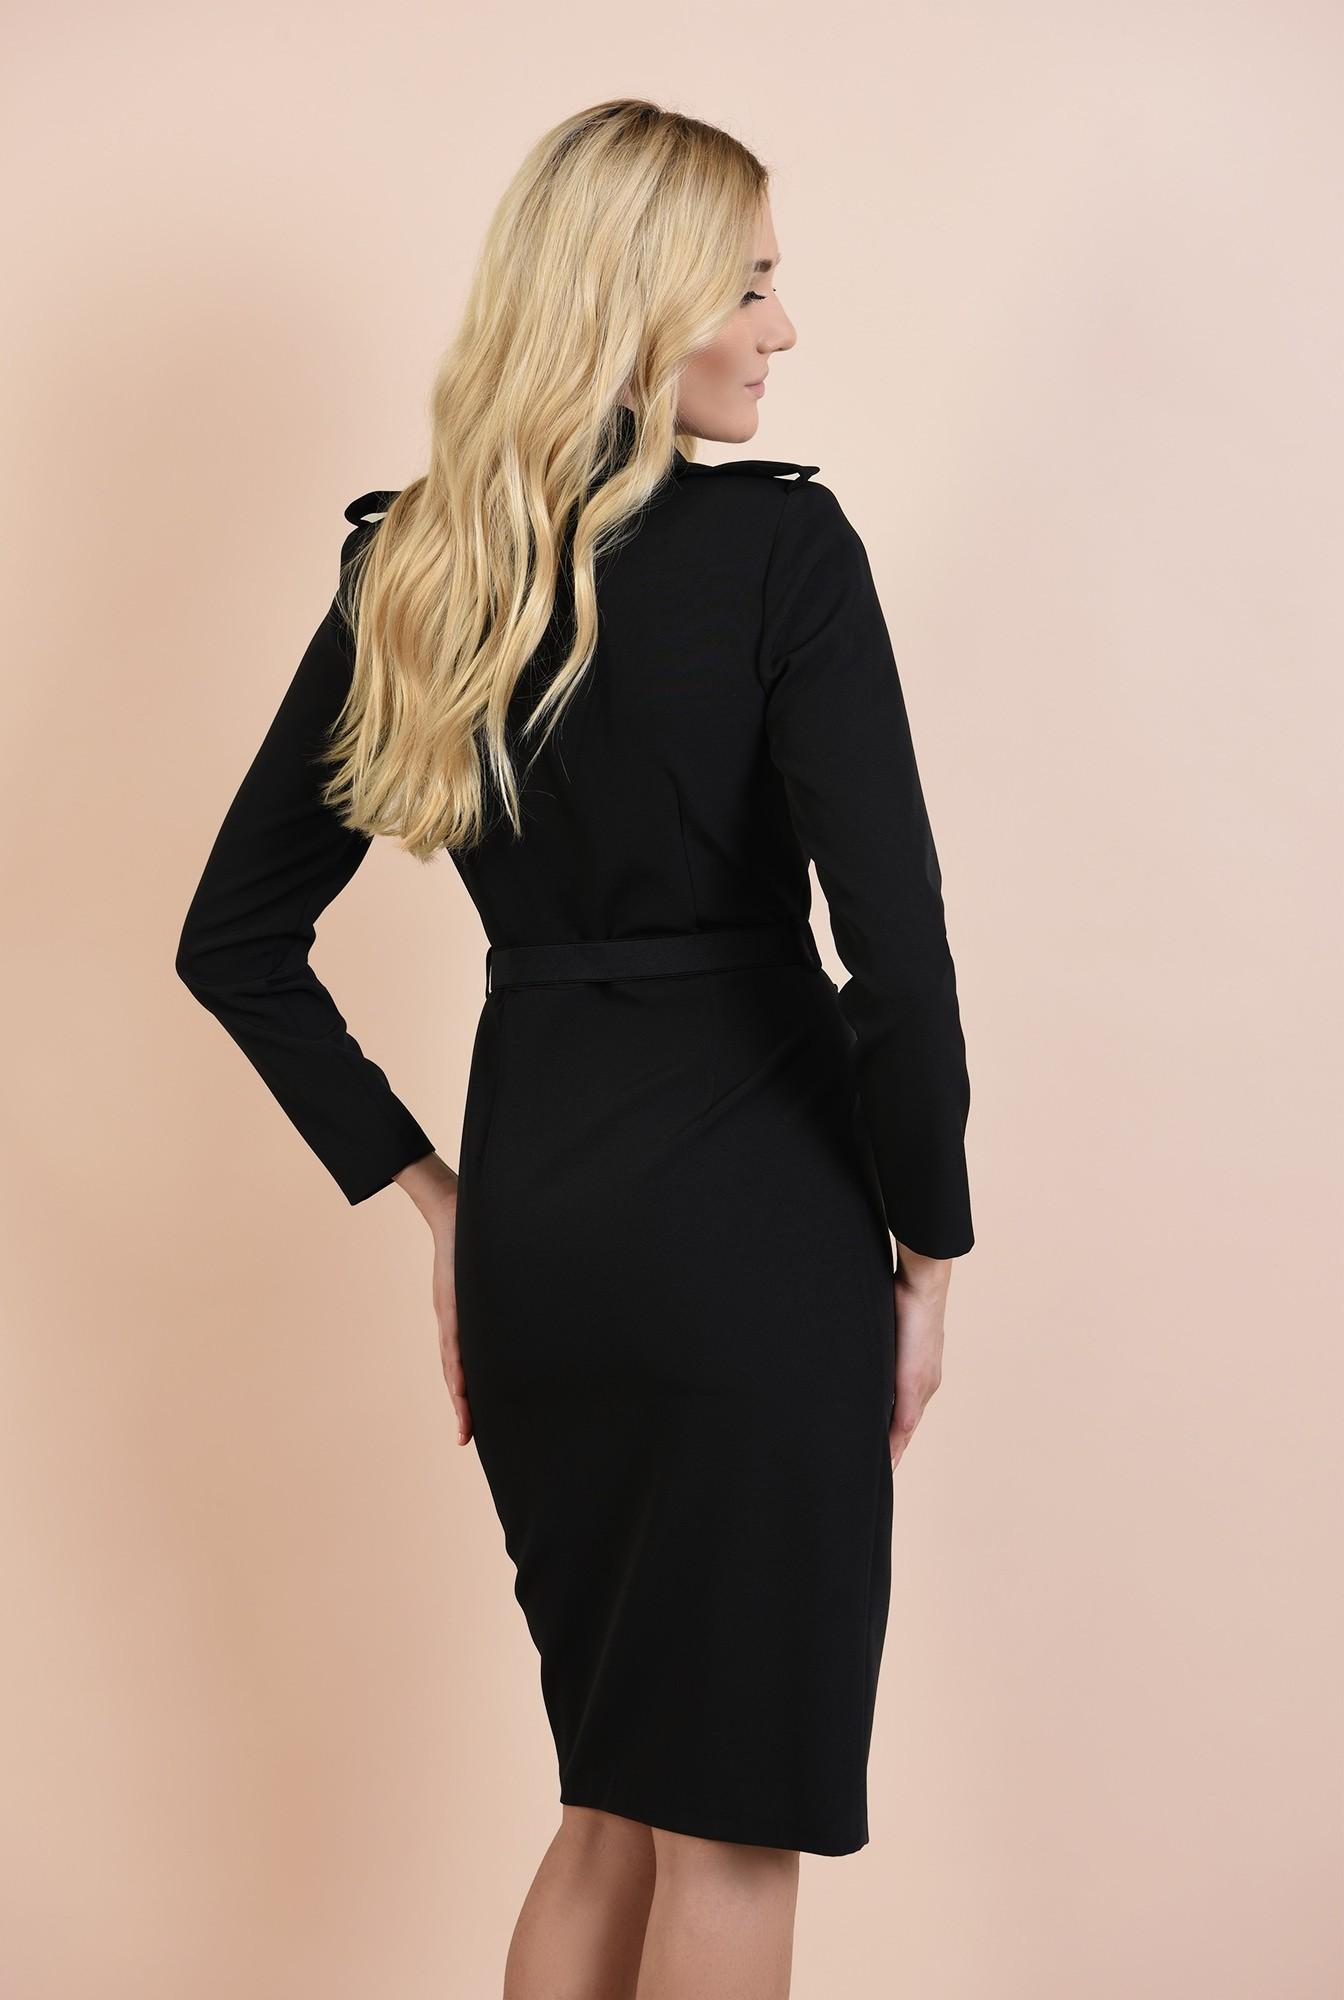 1 - rochie neagra, casual, nasturi aurii, epoleti, curea fronsata